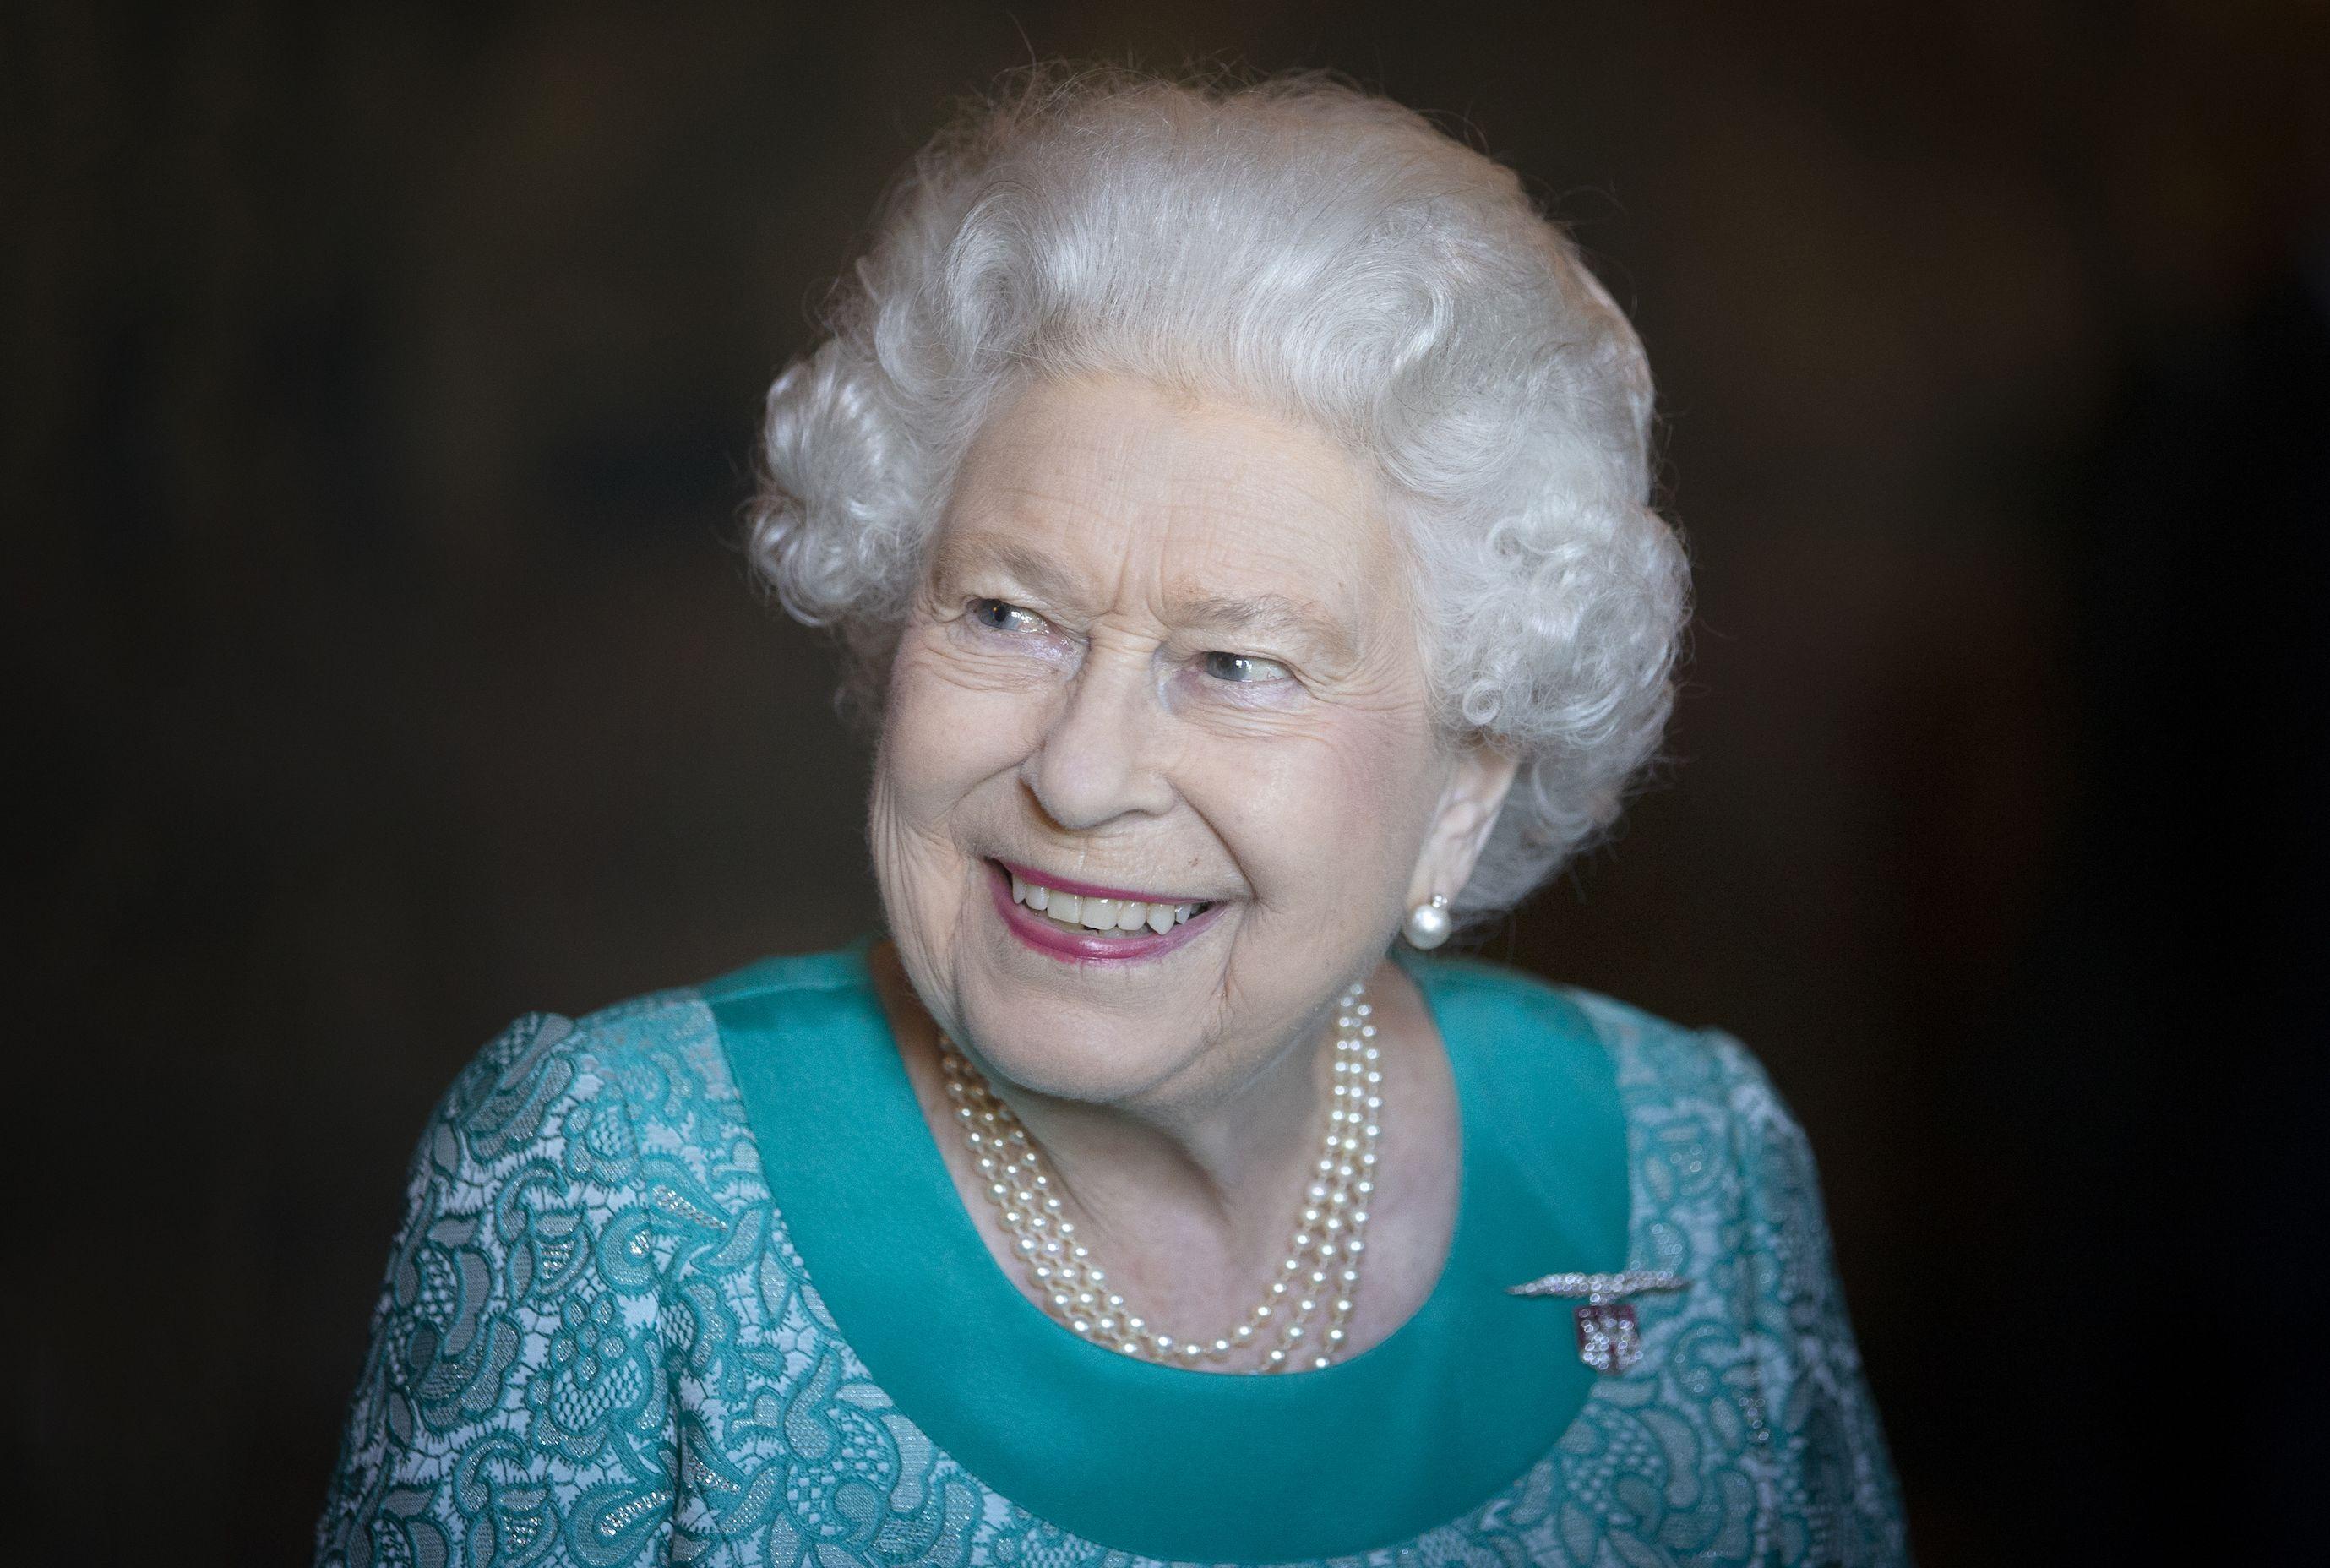 Vinyl Royal Family Queen Elizabeth II Green Dress Pop